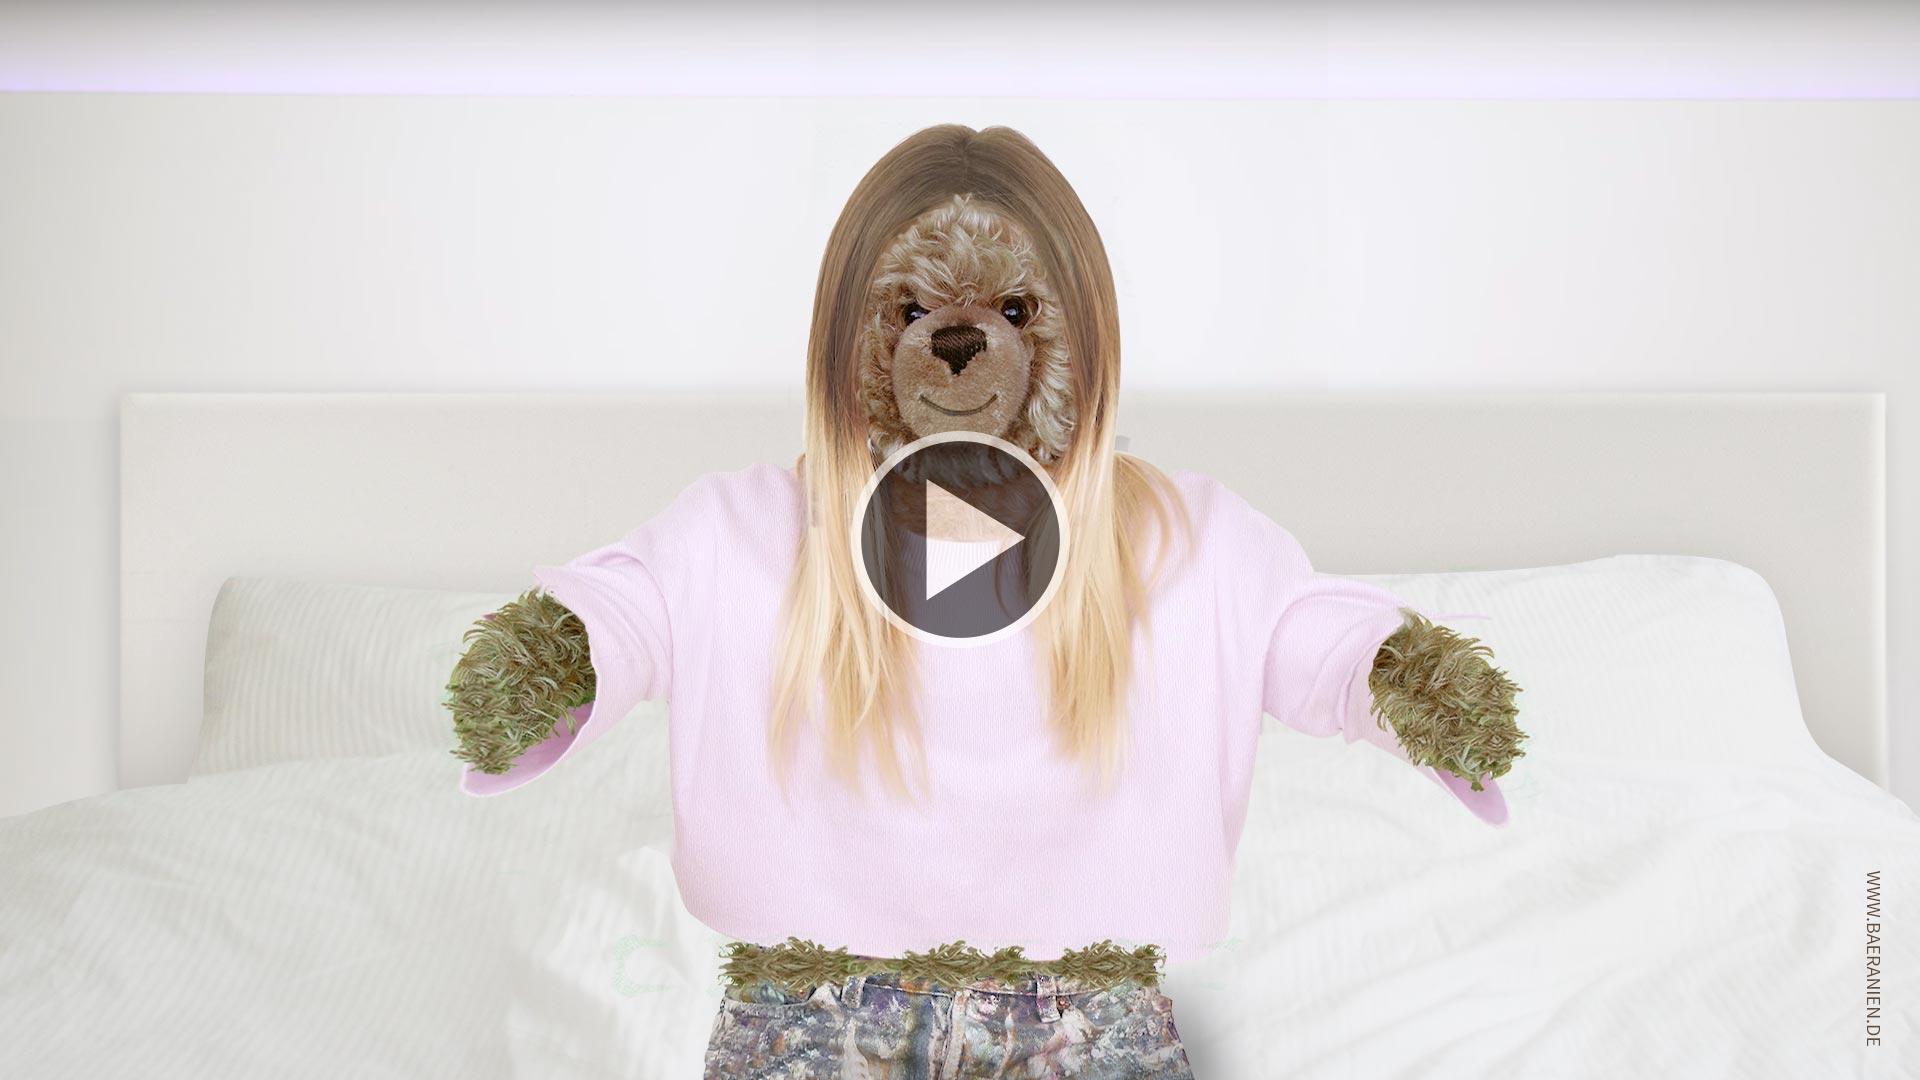 Teddybär-König Opa als Bibi